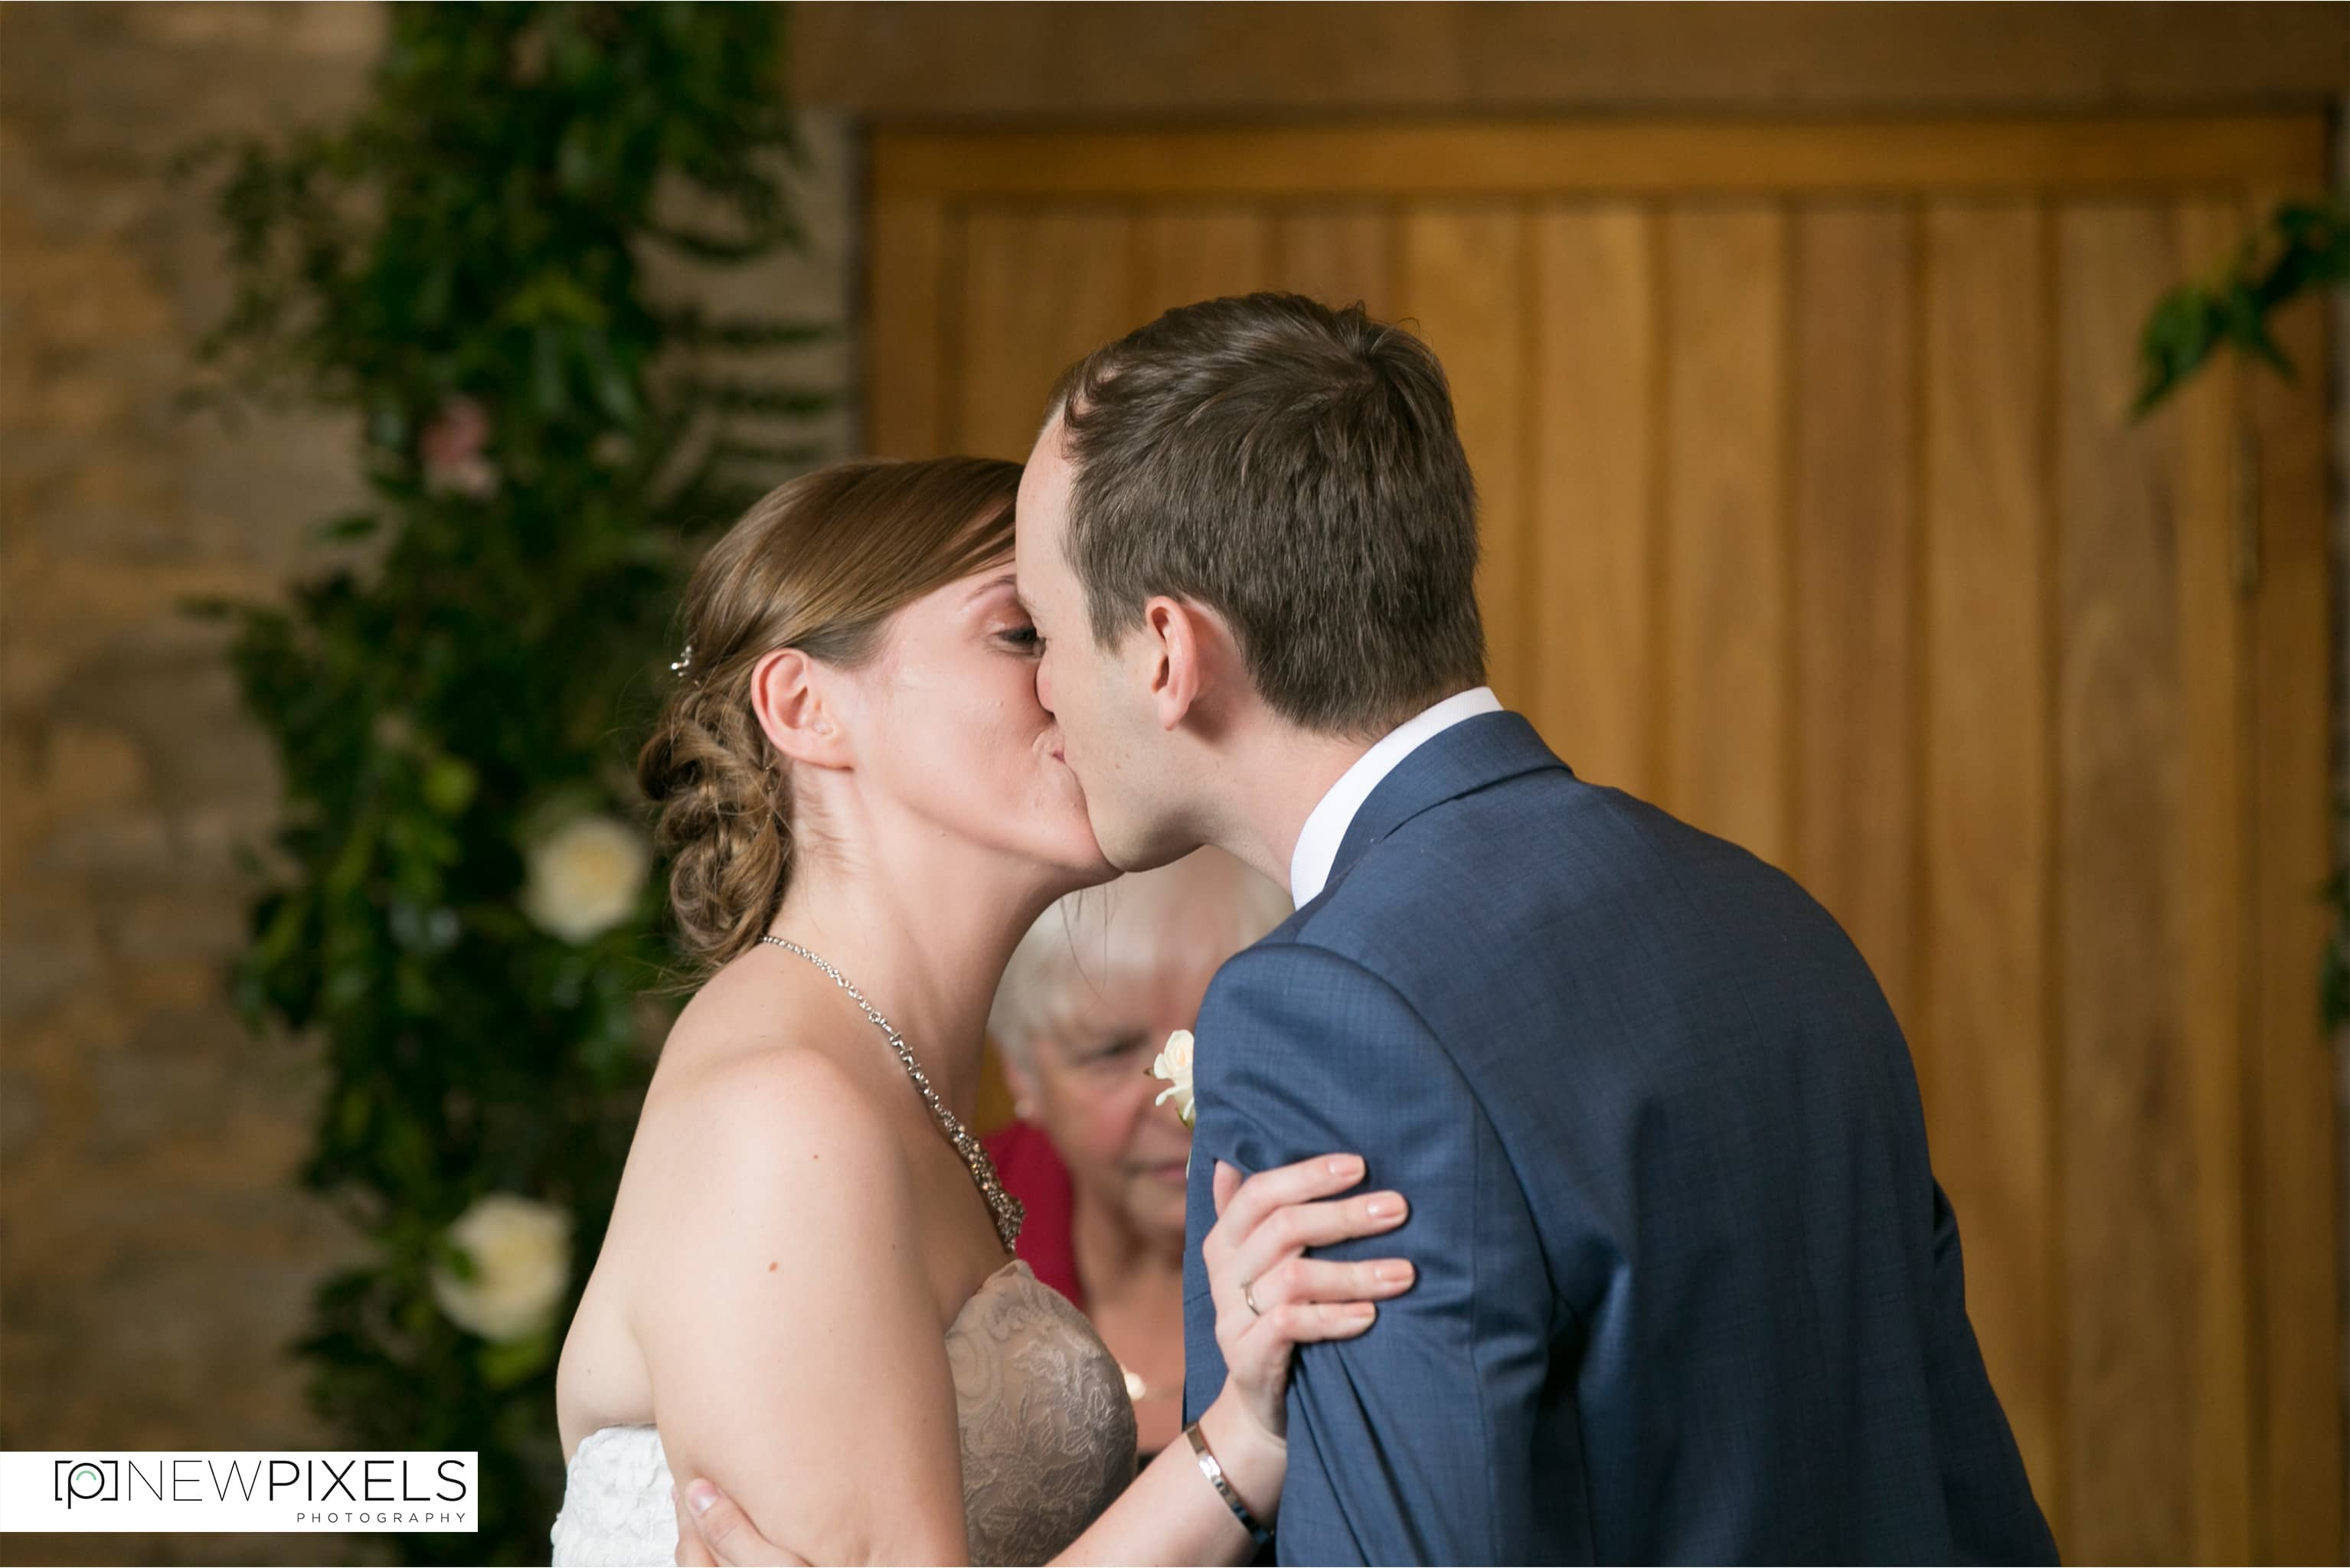 Hertfordshire Wedding Photography- New Pixels106